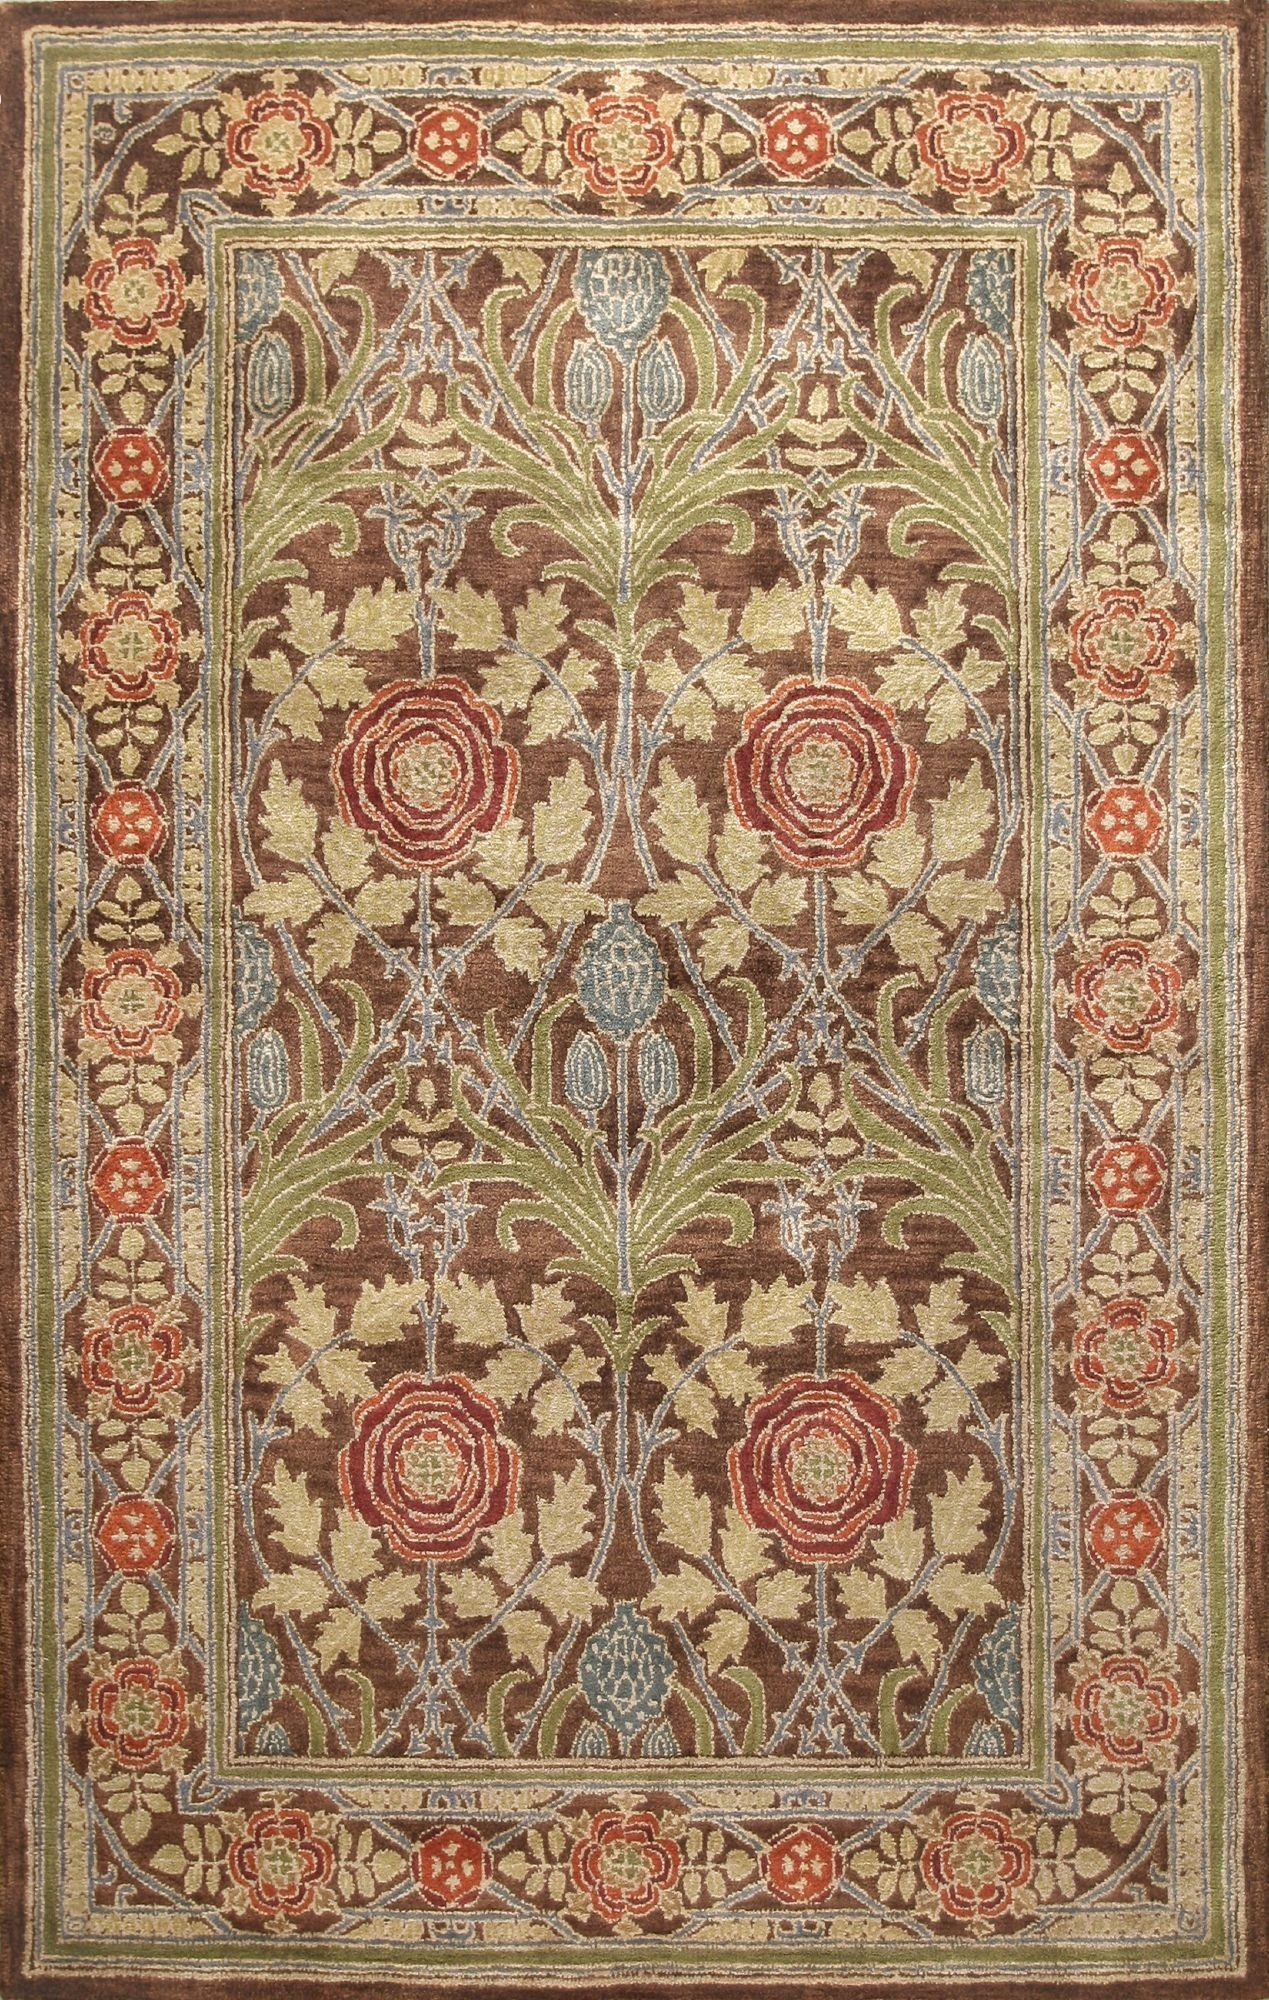 http://www.wayfair.com/Bashian-Rugs-Charlton-Surita-Chocolate-Area-Rug-QKD1303.html?piid[0]=6885050